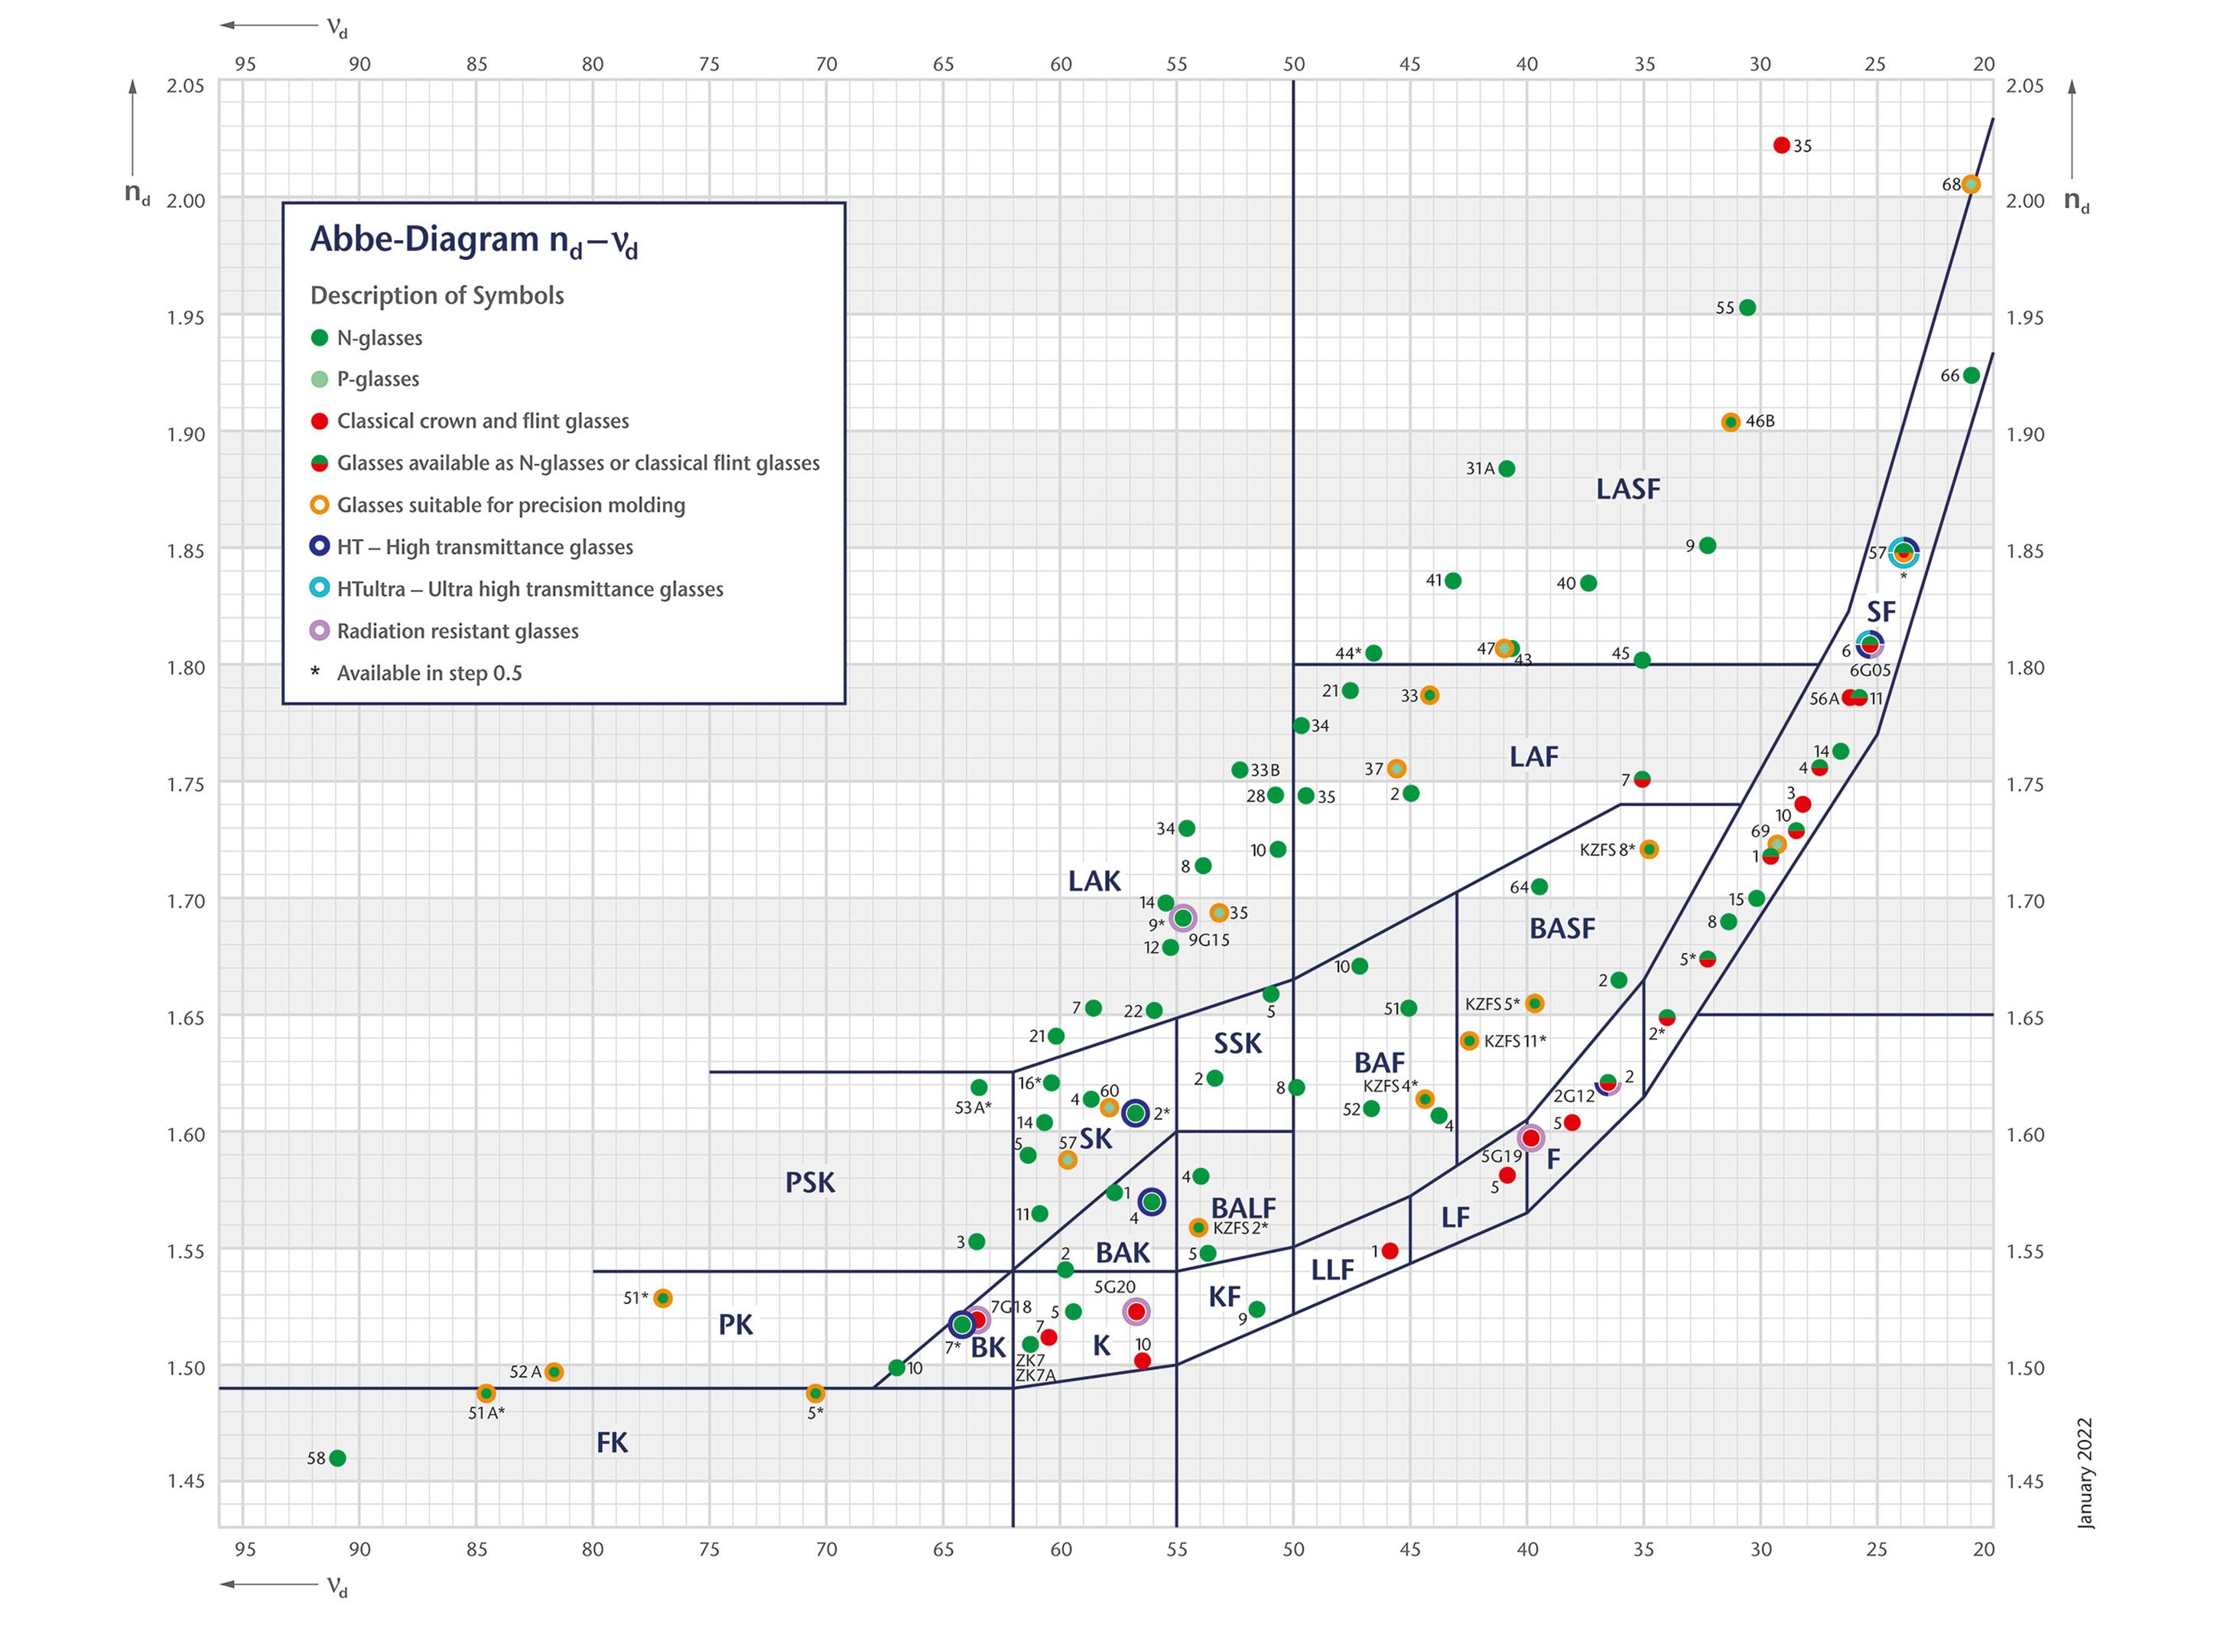 Abbe Diagram - nd-vd Picture for OnEx - EN 2020